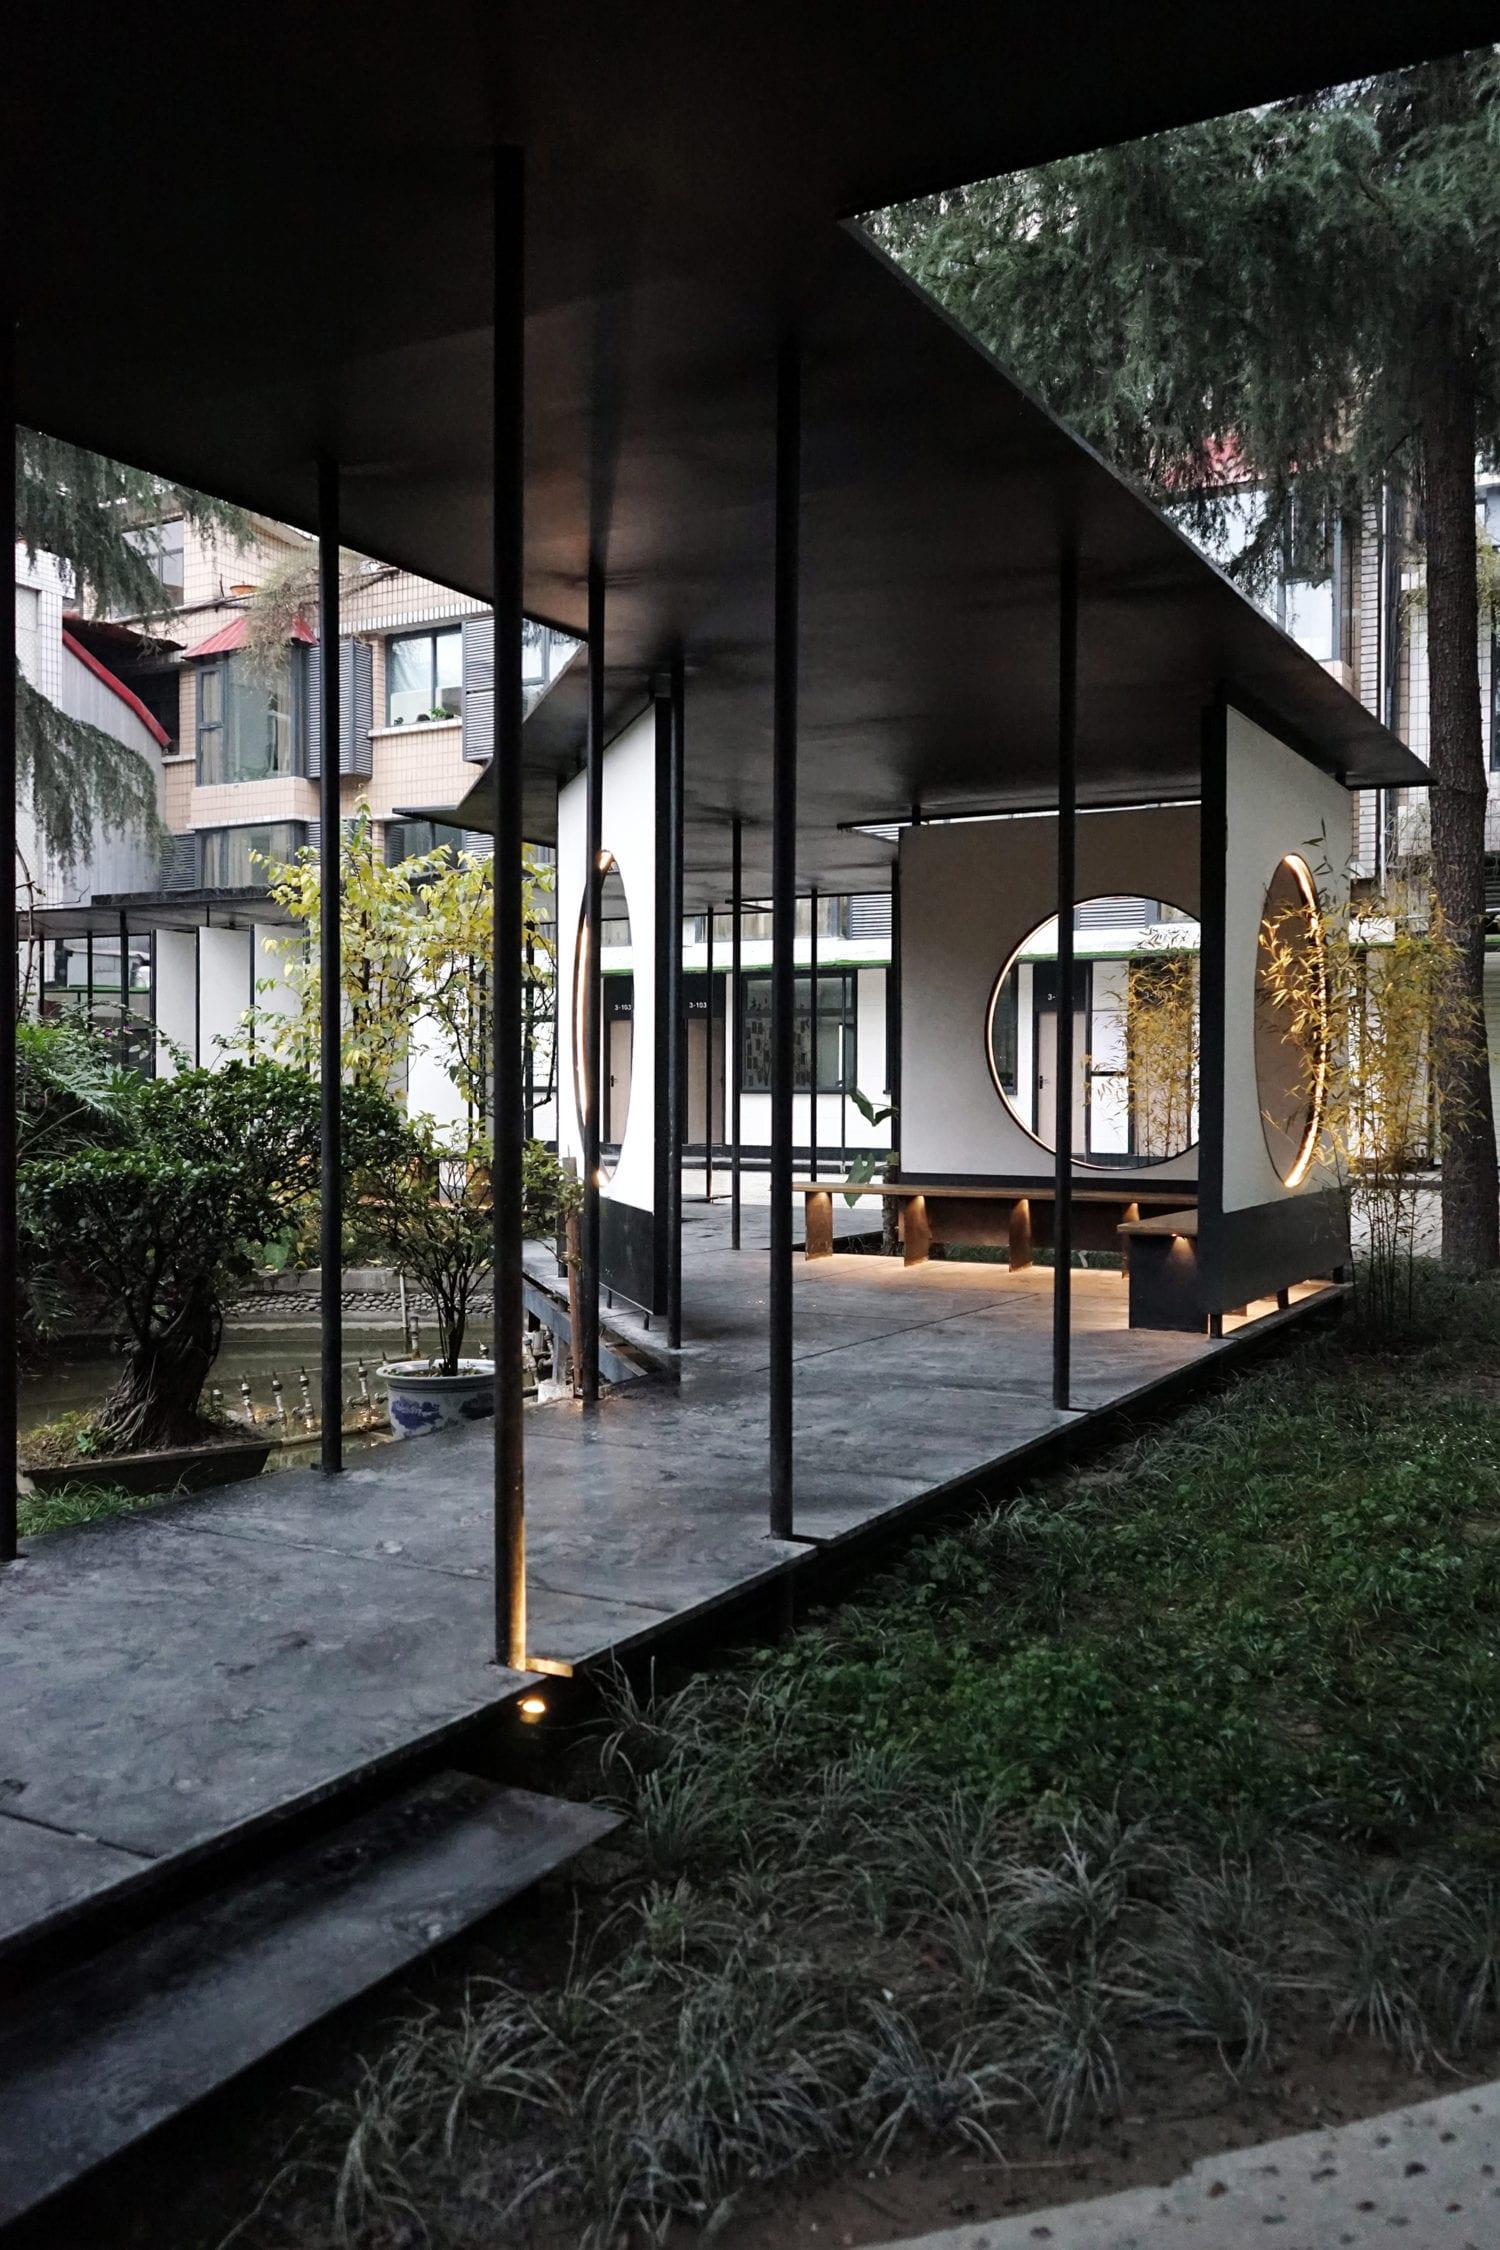 The Garden Island Countyard Renewal in Chengdu, China by epos architecture | Yellowtrace